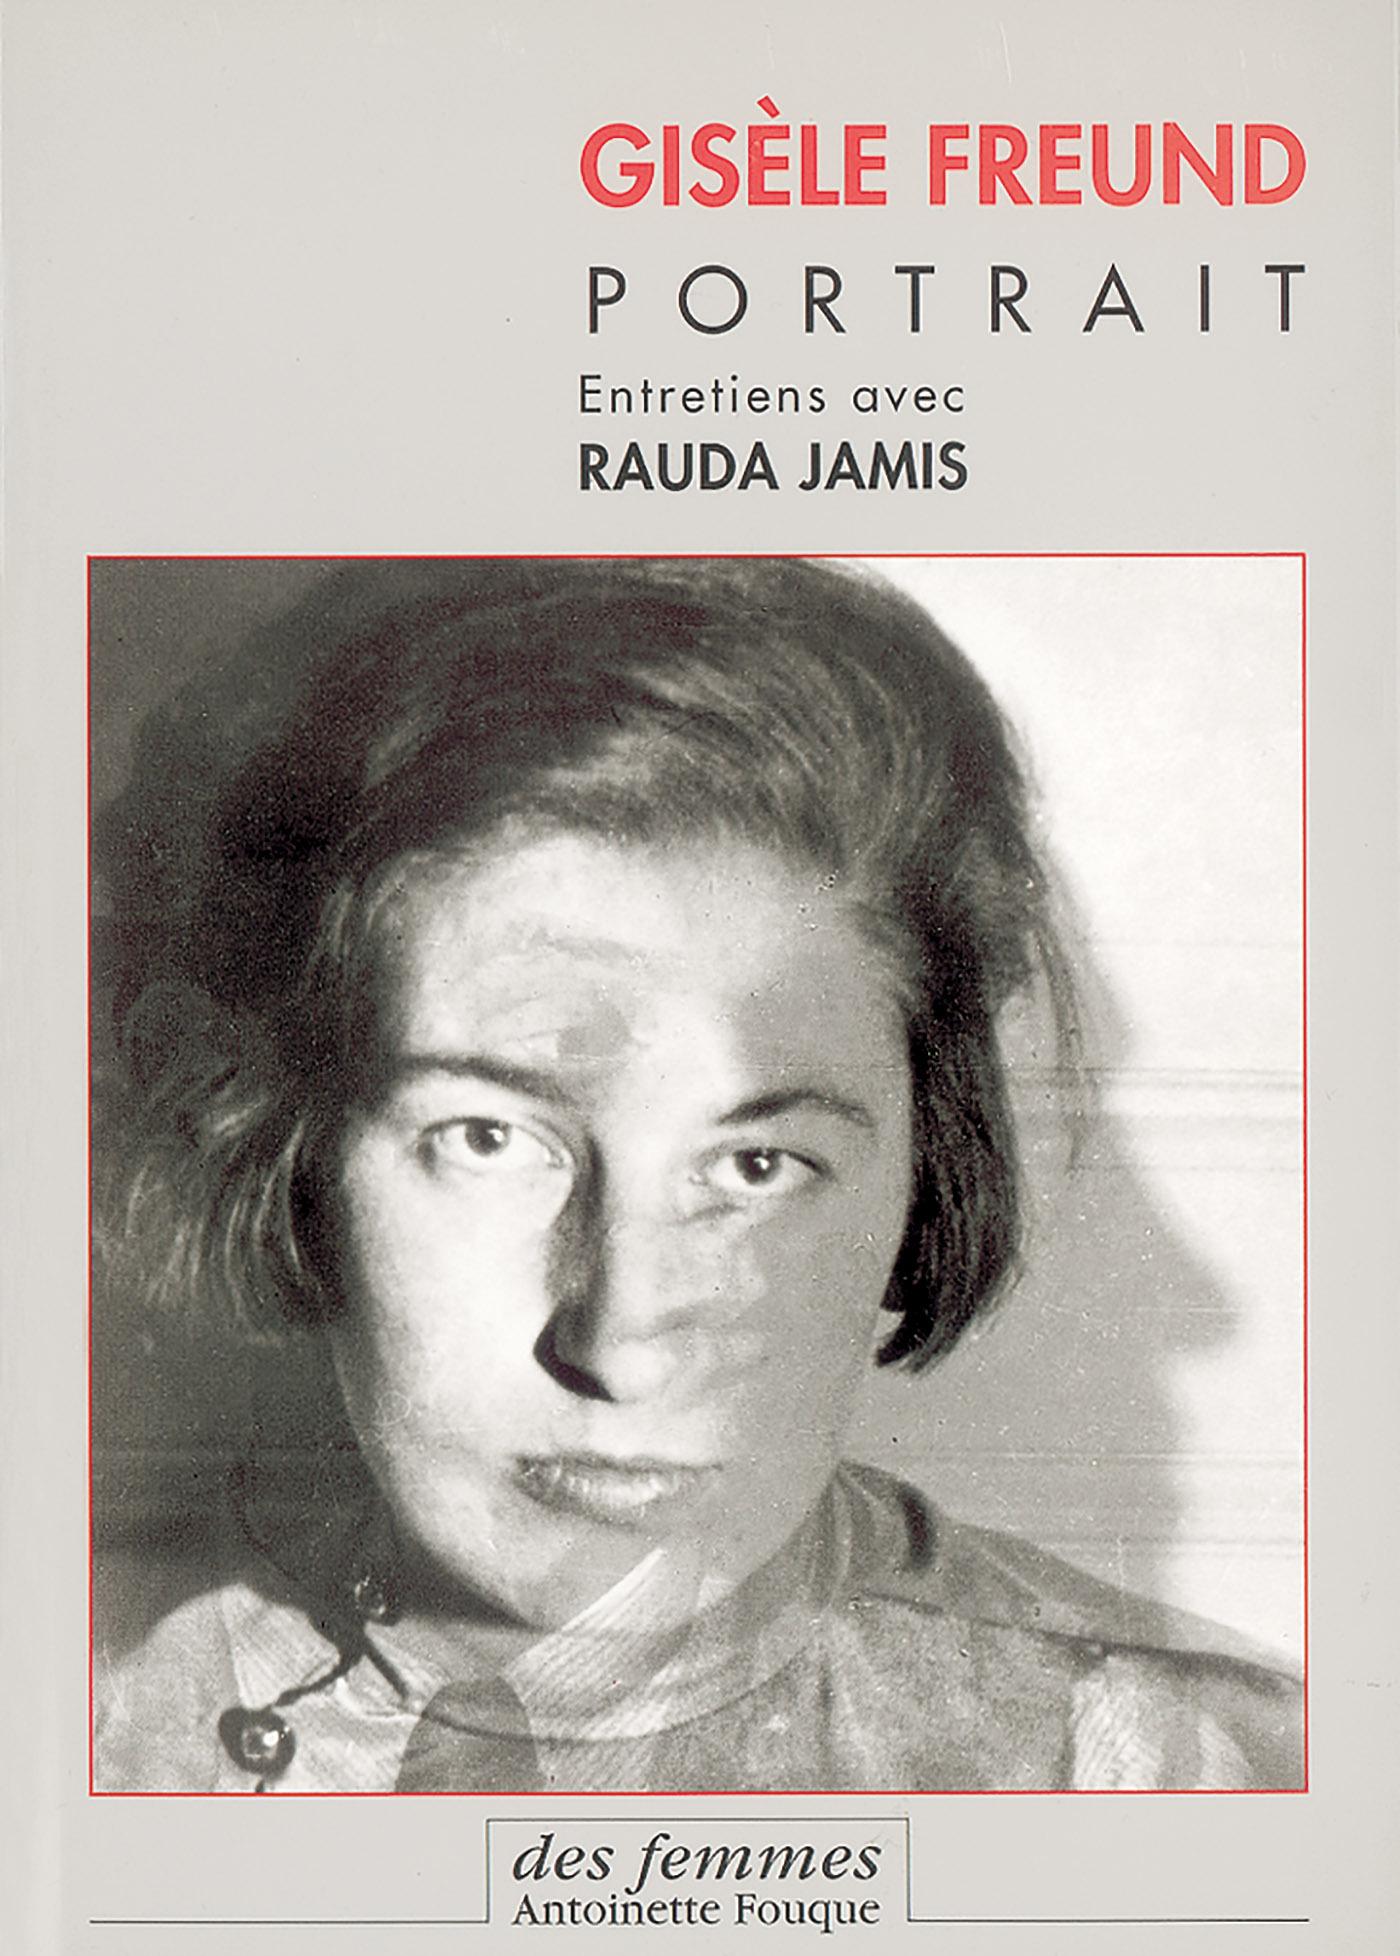 GISELE FREUND, PORTRAIT - ENTRETIENS AVEC RAUDA JAMIS